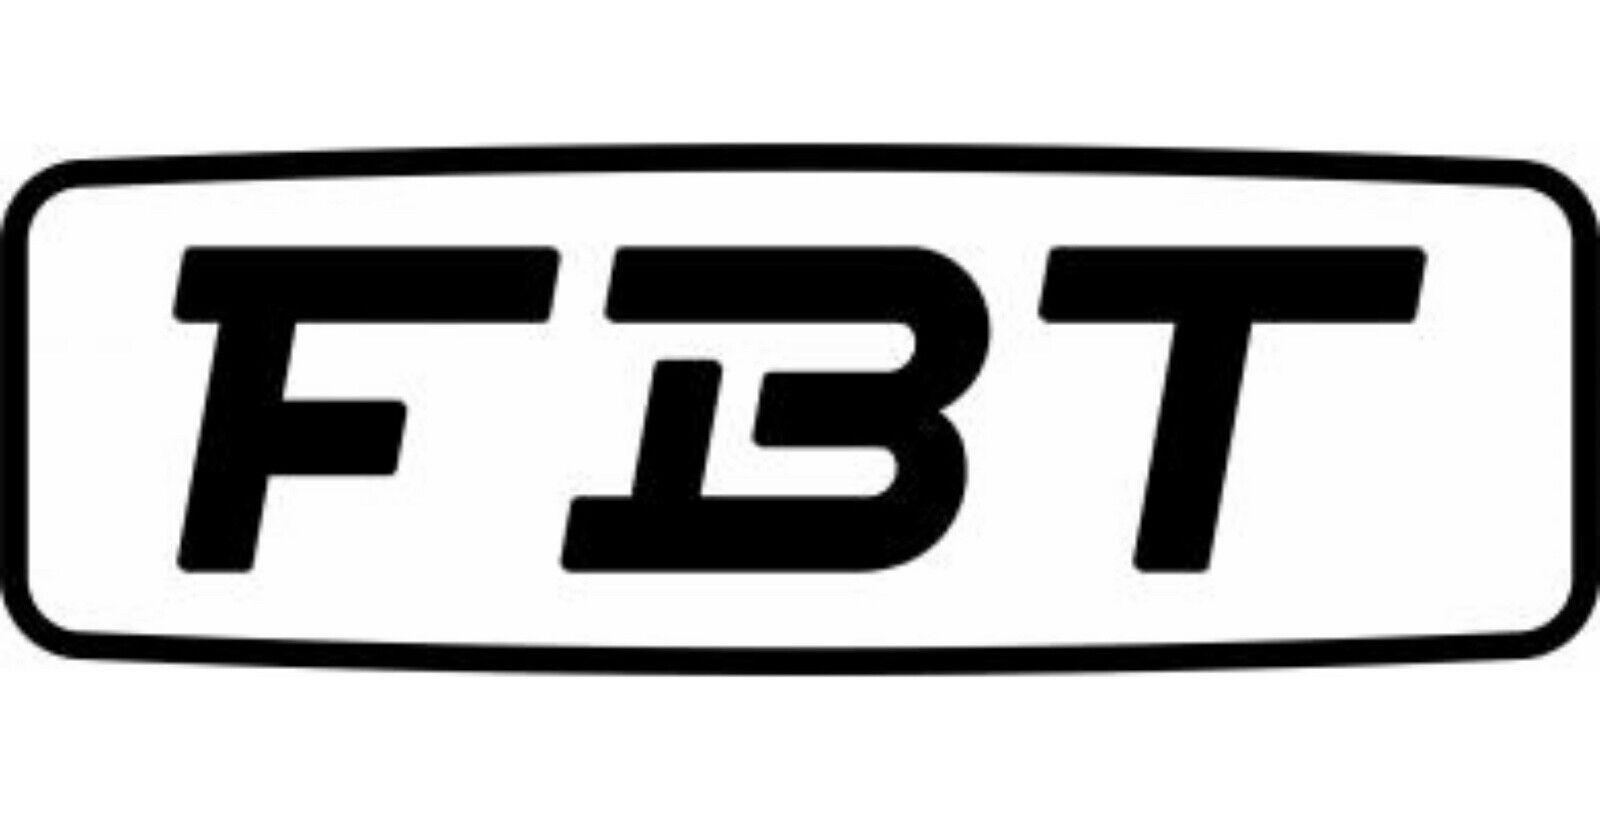 FBT 250, 250LB, 500R, 500R2, 1200R Schematic Service Manual Schaltplan  Technique | eBay